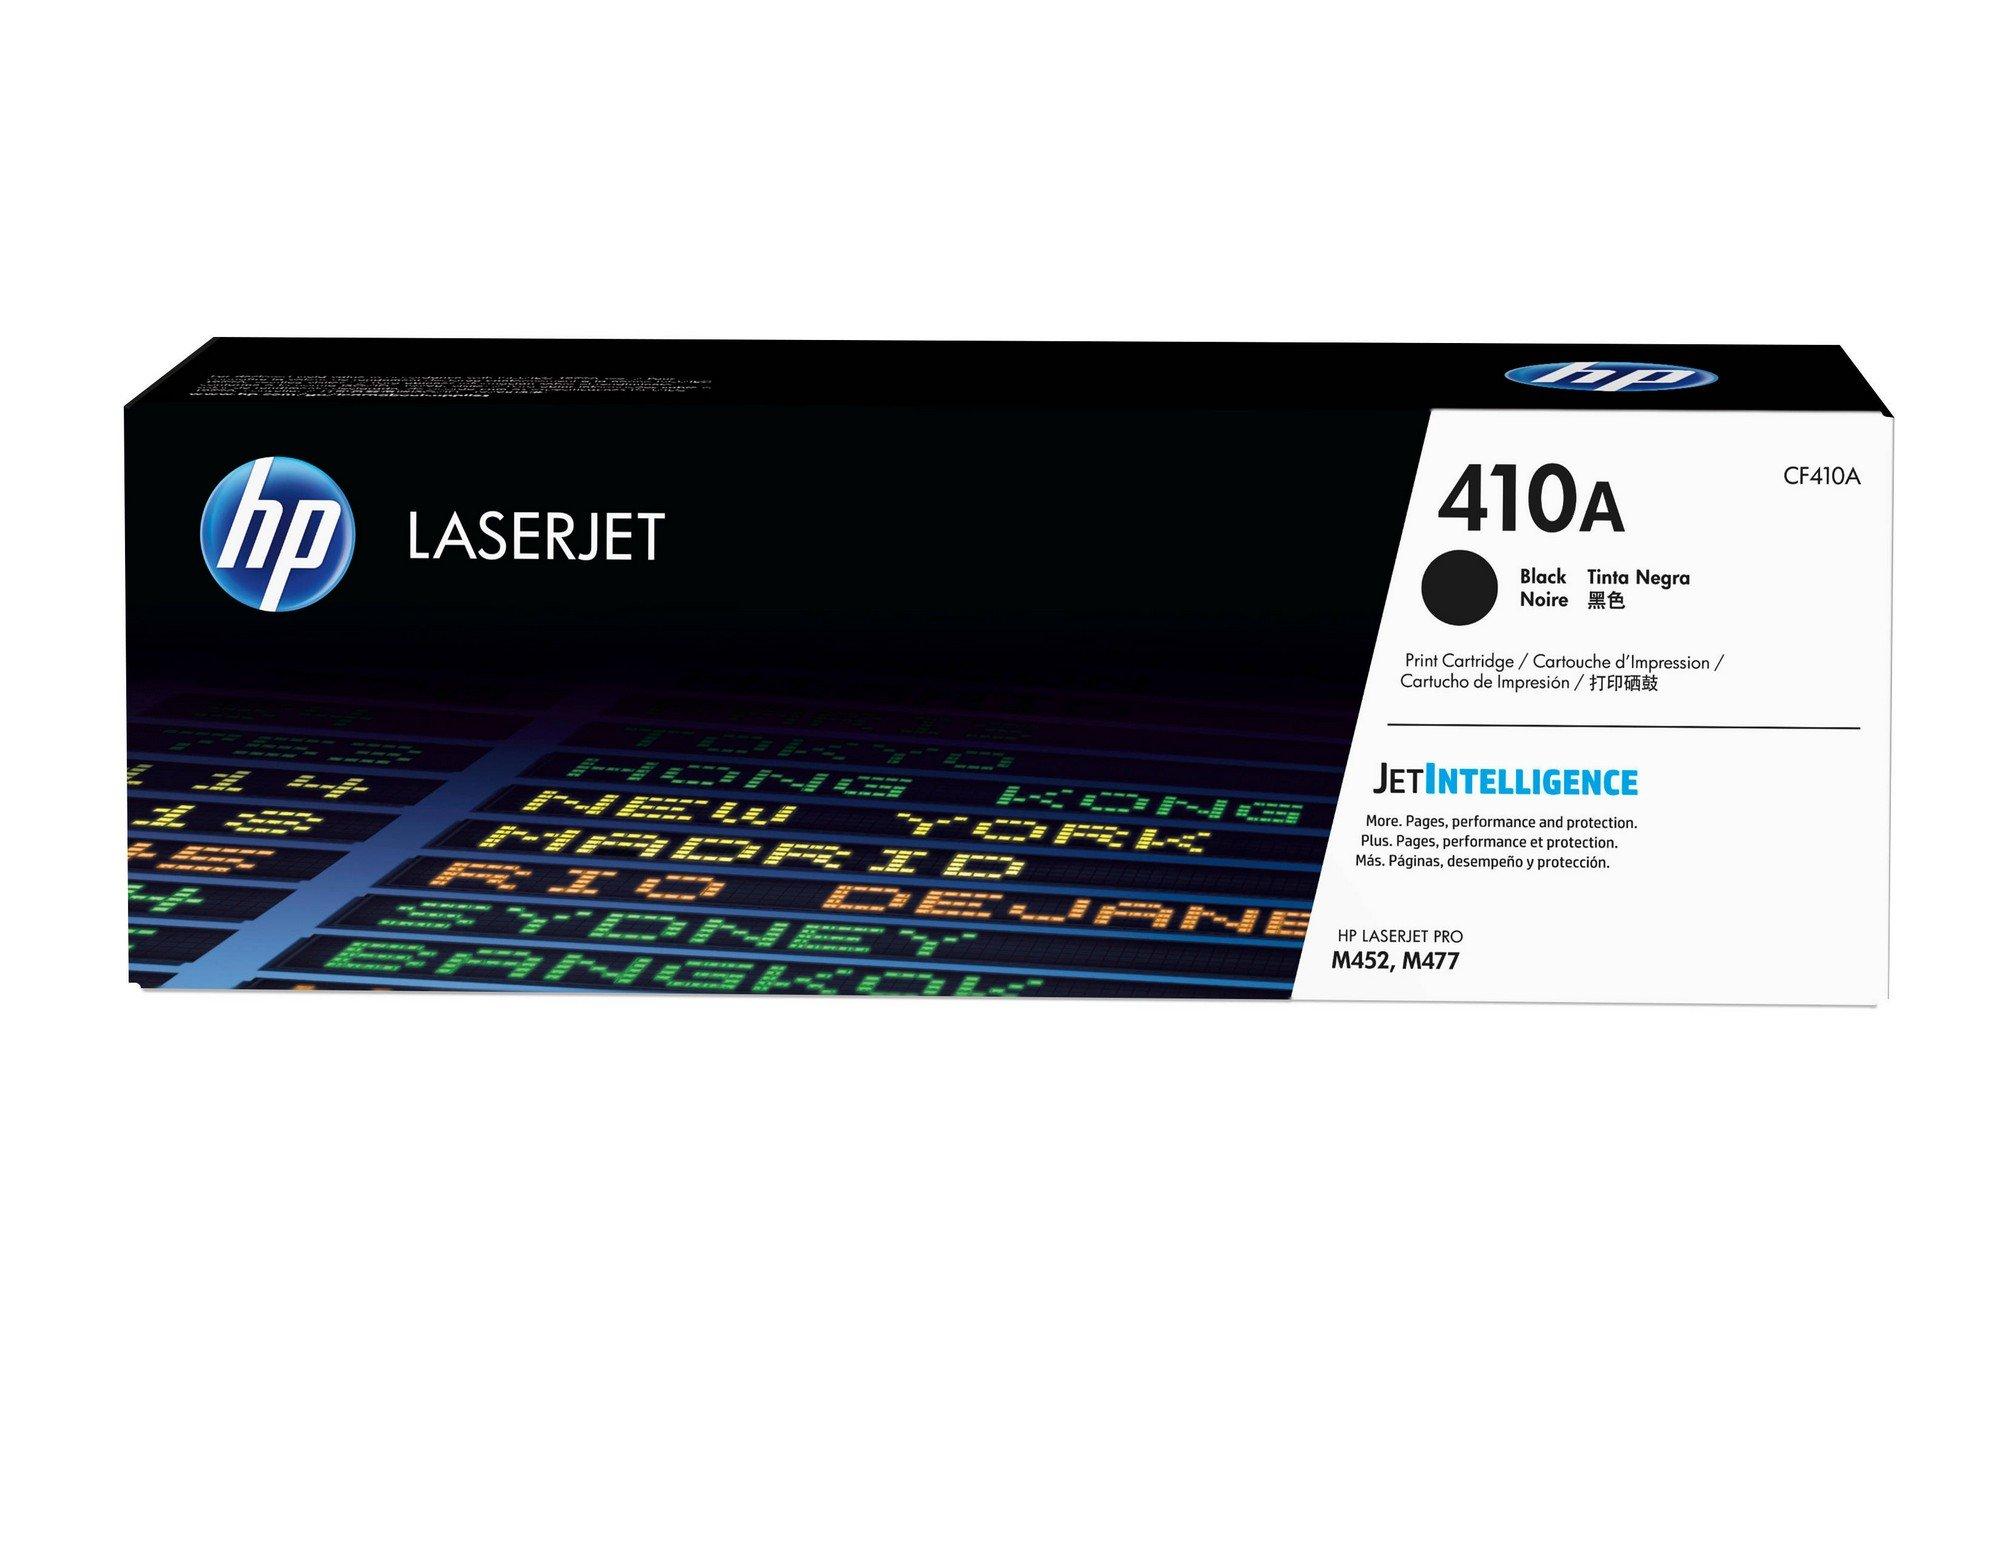 HP 410A (CF410A) Toner Cartridge, Black for HP Color LaserJet Pro M452dn, M452dw, M452nw, MFP M377dw, MFP M477fdn, MFP M477fdw, MFP M477fnw